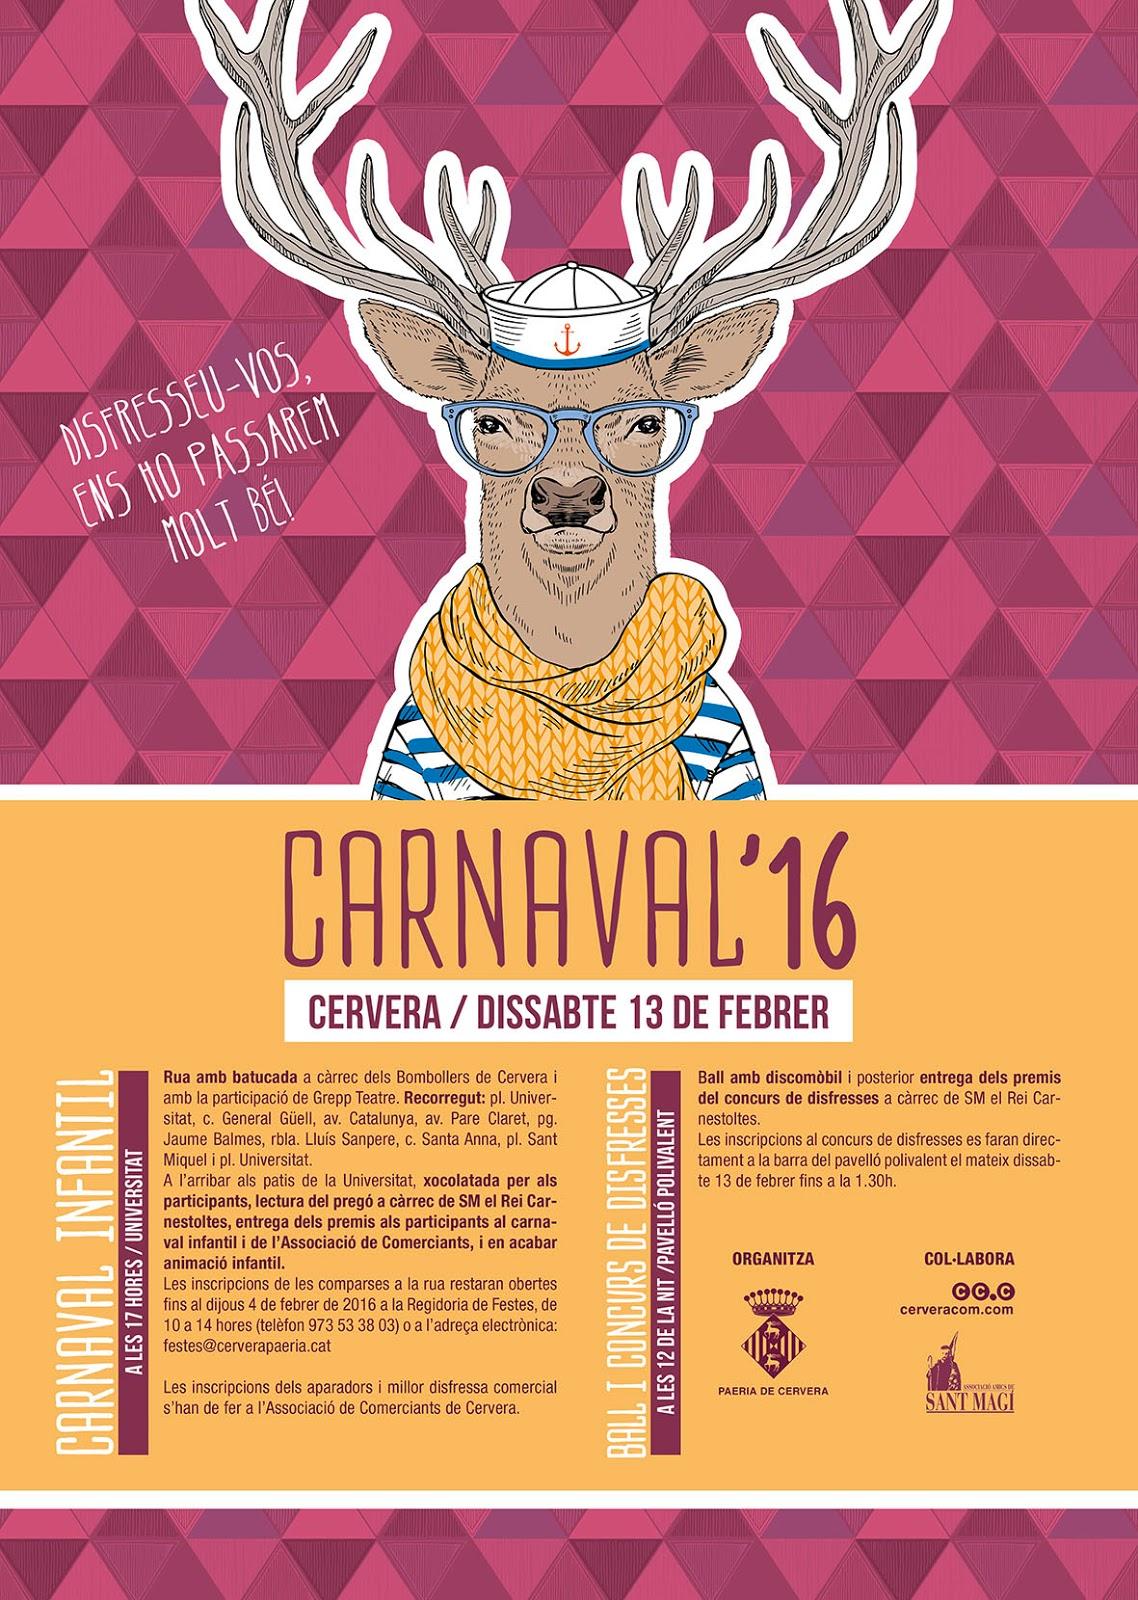 cartell Carnaval de Cervera 2016